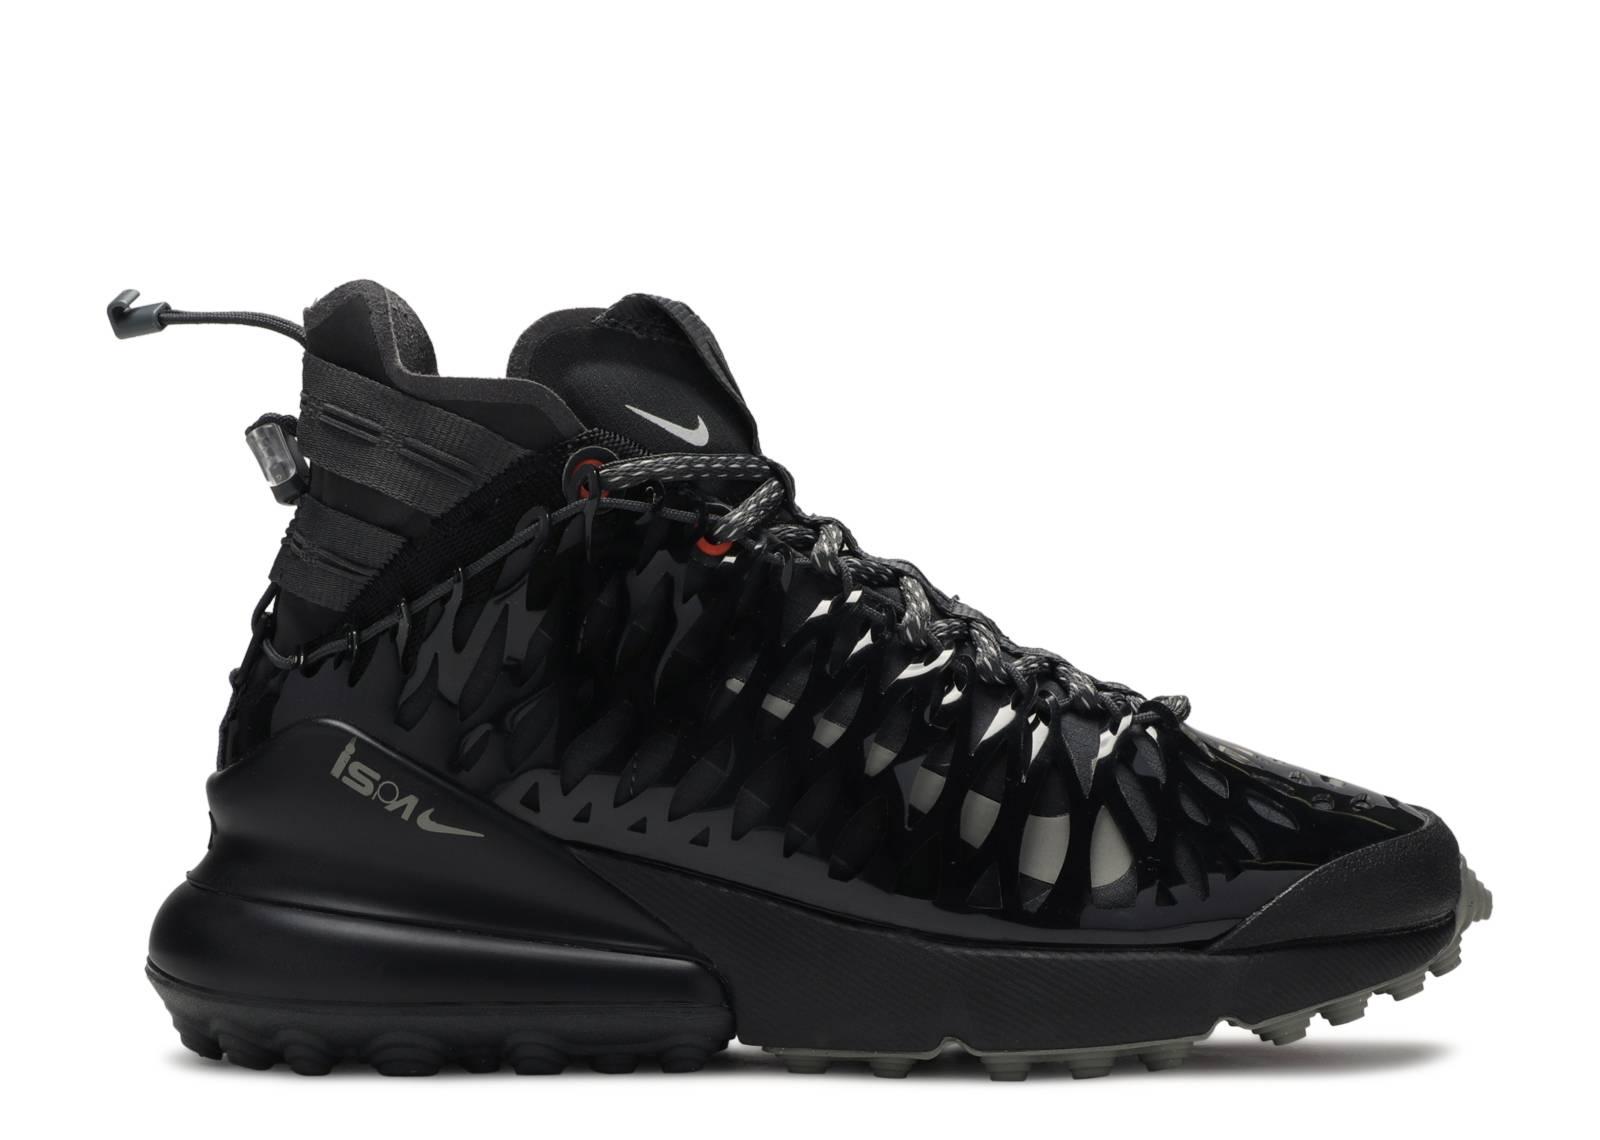 Nike Sportswear Air Max 270 SP SOE ISPA Black Anthracite Grey BQ1918 002 Men's 9 | eBay